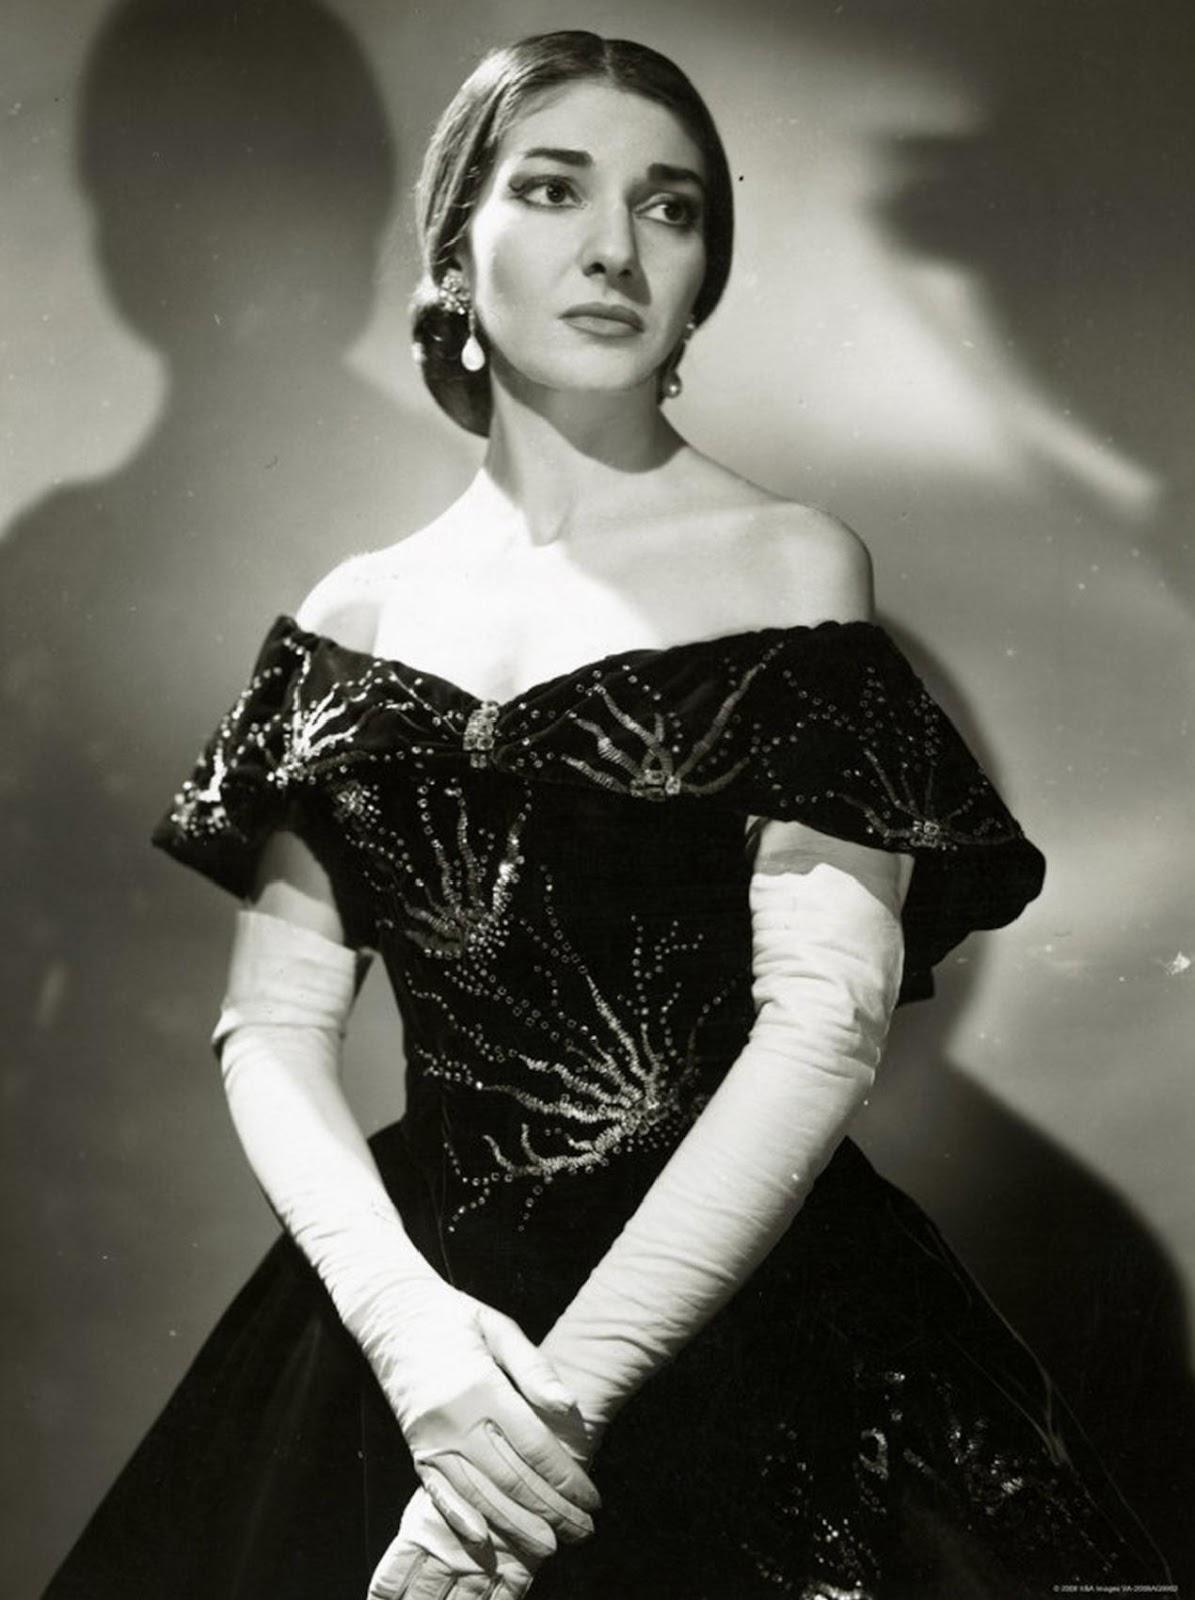 http://upload.wikimedia.org/wikipedia/commons/1/10/Maria_Callas_%28La_Traviata%29_2.JPG